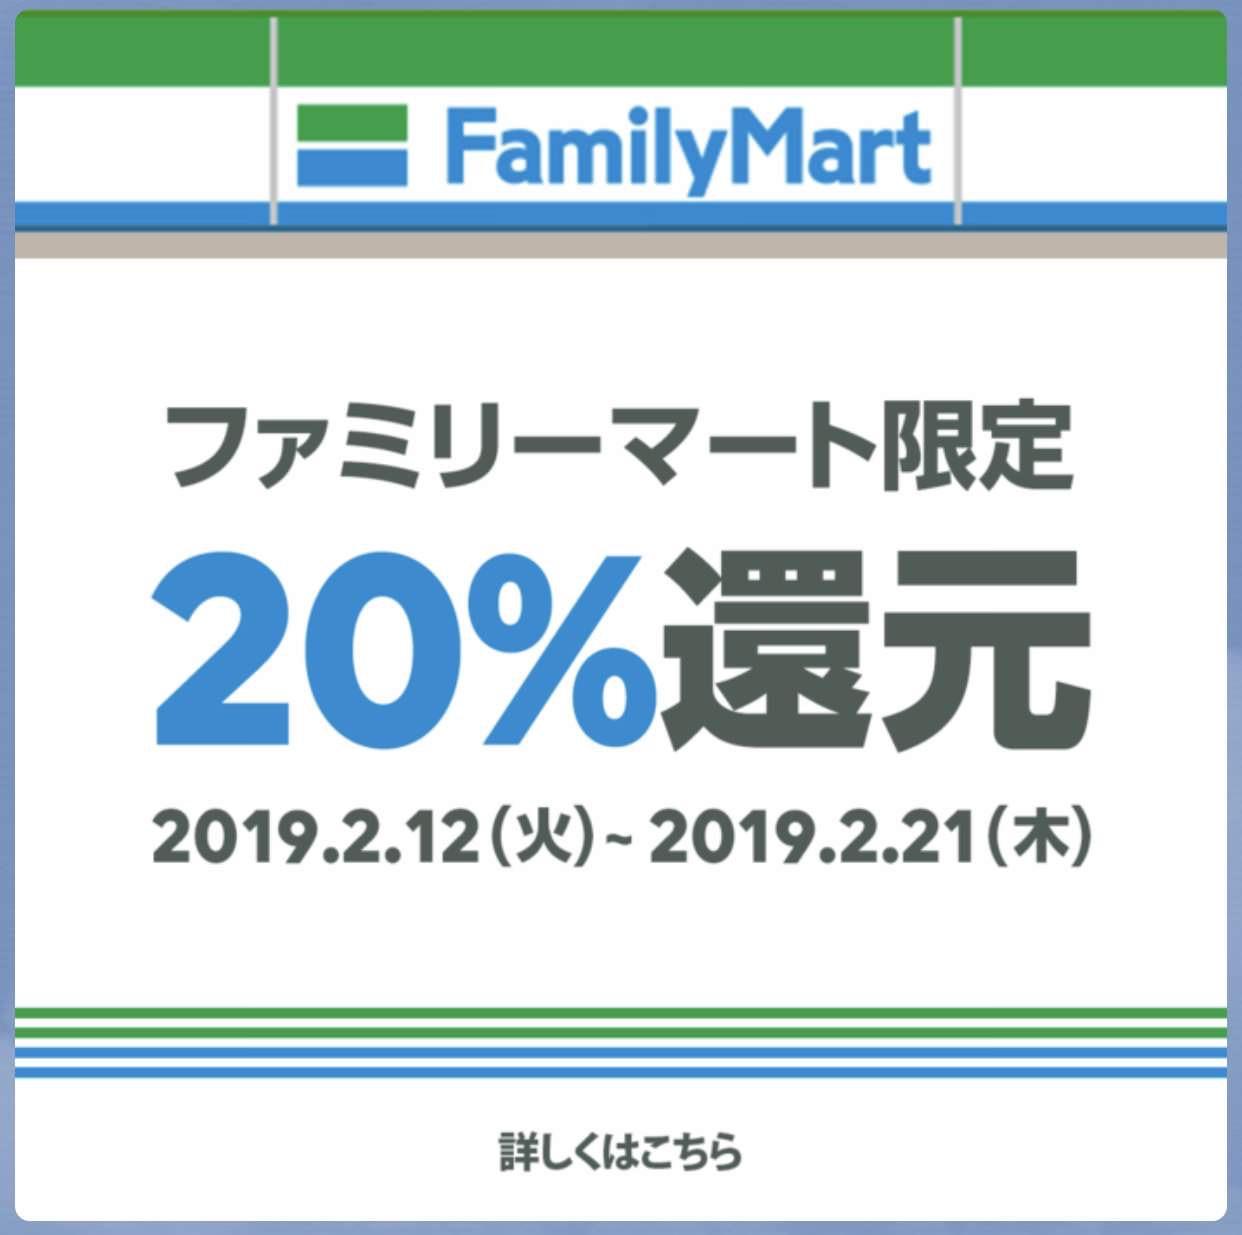 【LINE Pay】ファミリーマート限定20%還元キャンペーン(2/21まで)